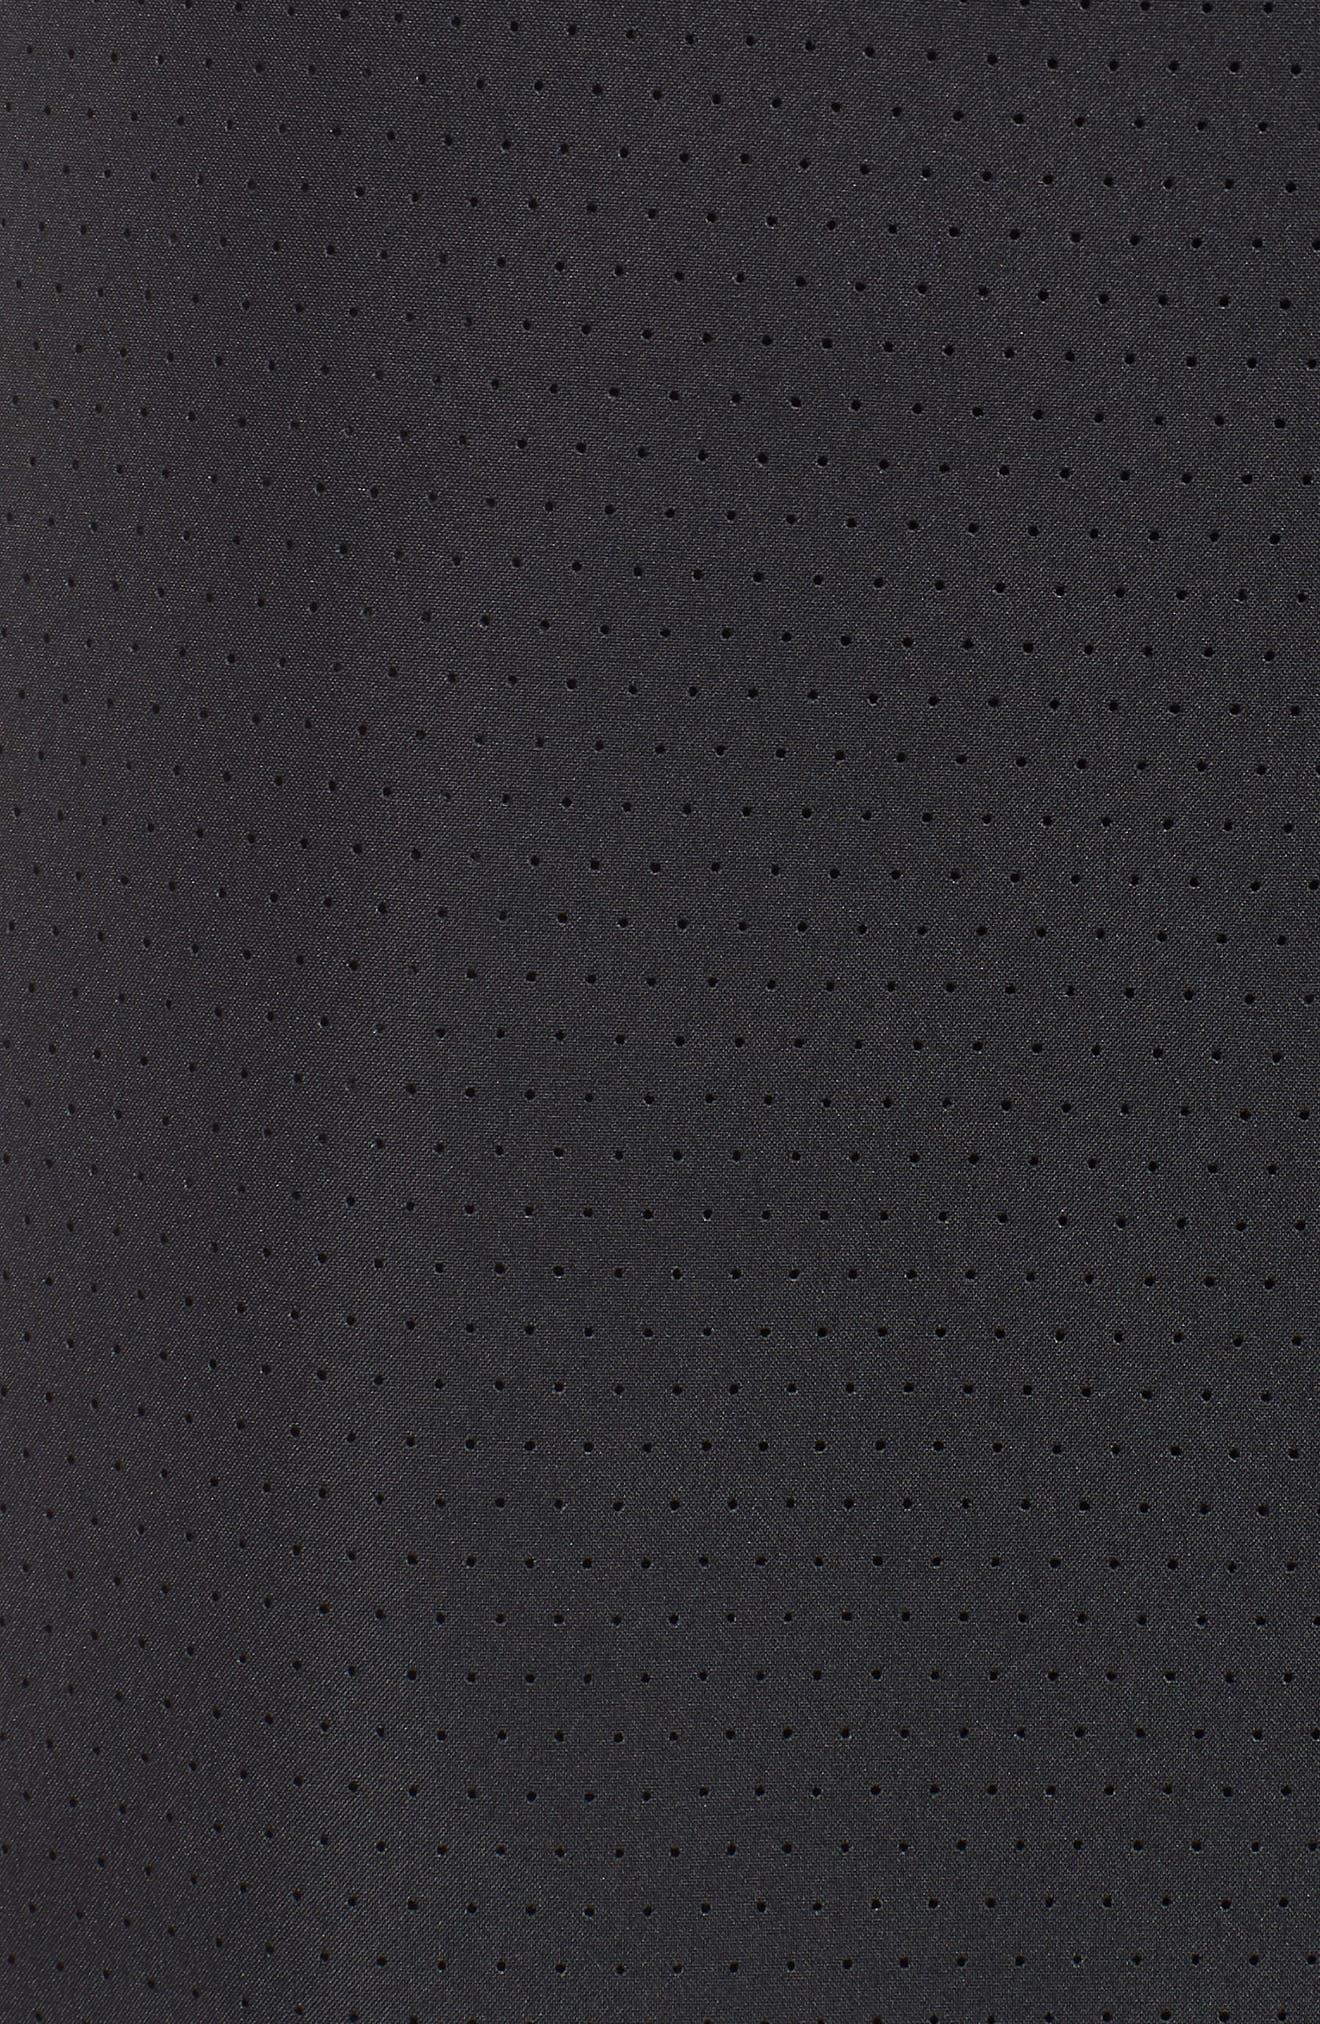 Running Challenger 2-in-1 Shorts,                             Alternate thumbnail 5, color,                             BLACK/ BLACK